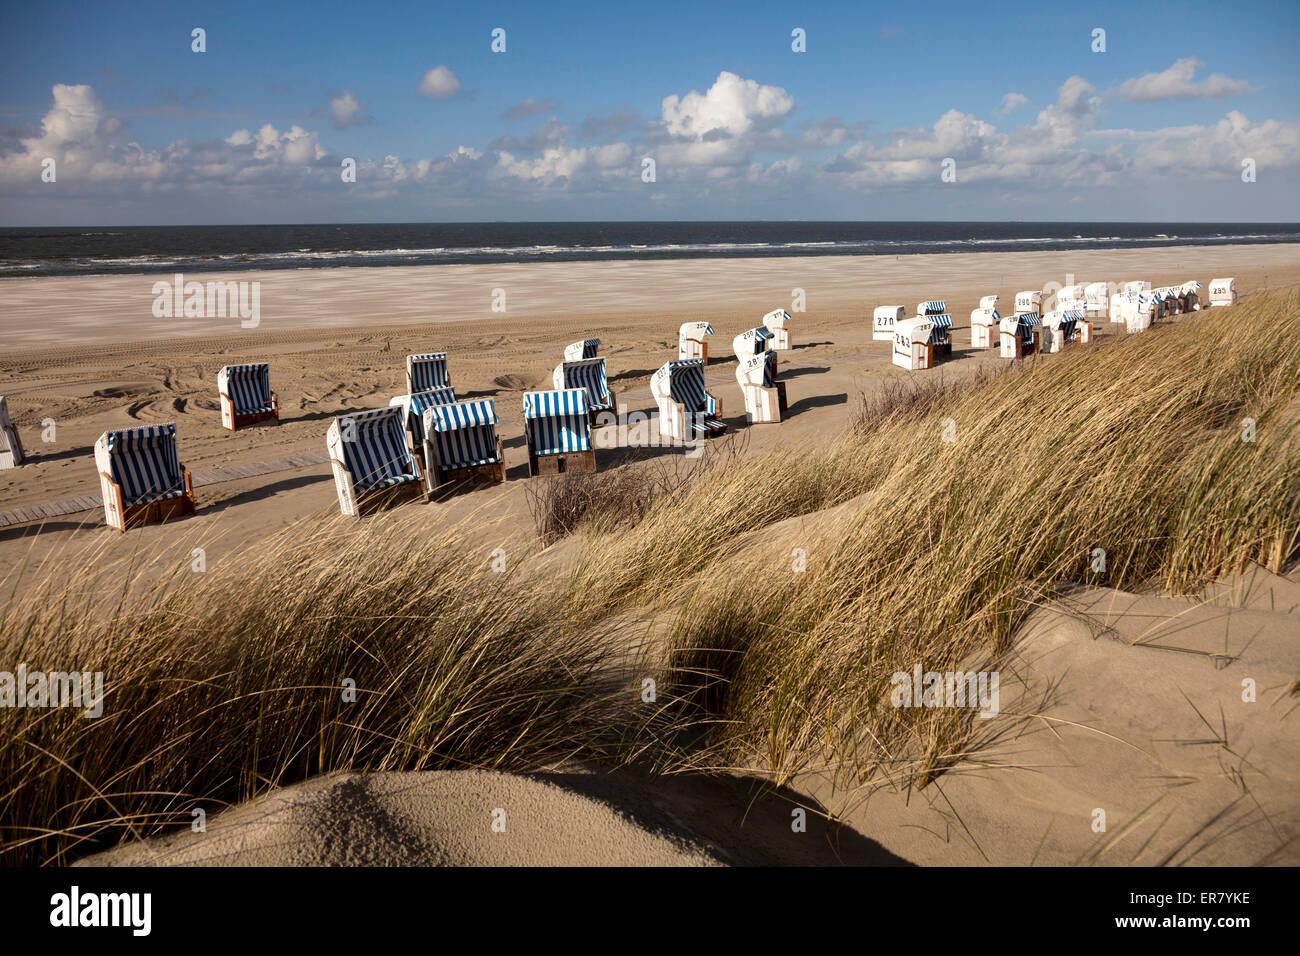 Strandkorb - beach chairs on the main beach, East Frisian Island Spiekeroog, Lower Saxony, Germany Stock Photo